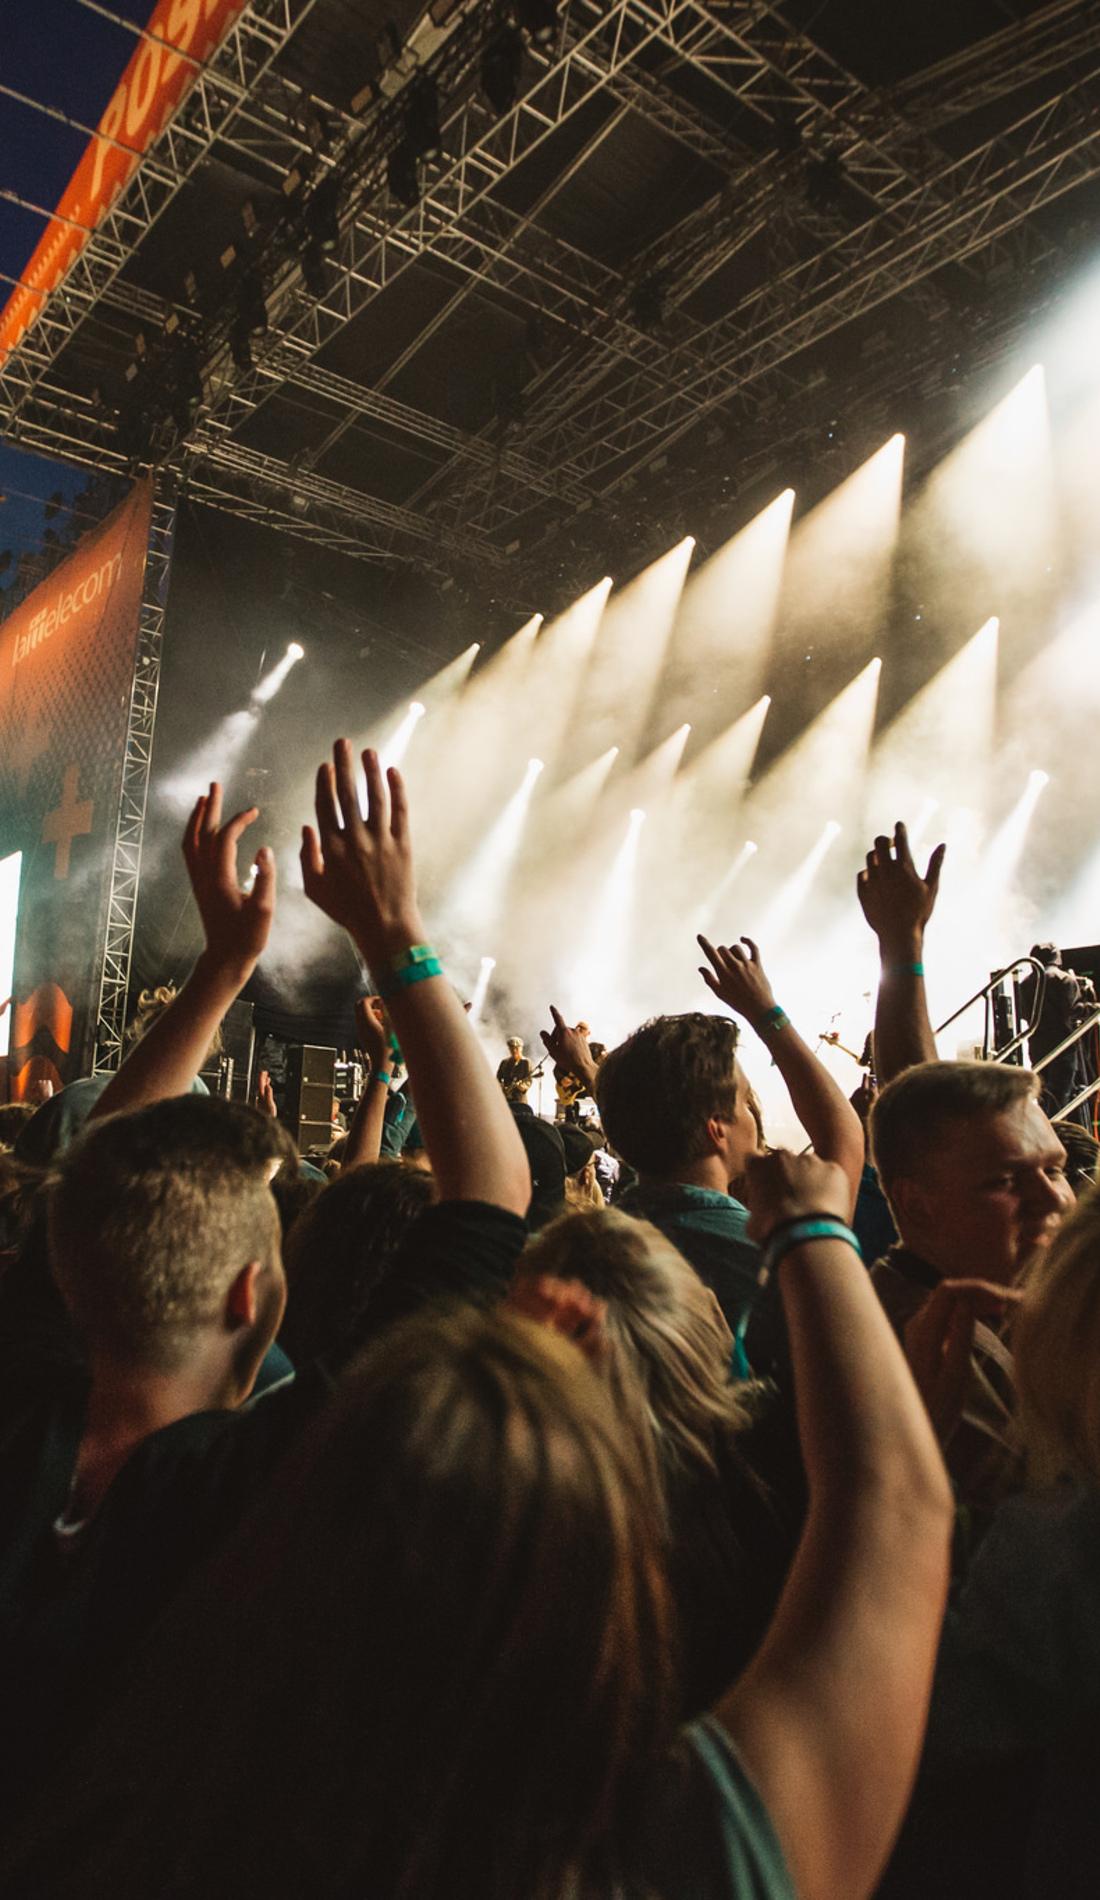 A Shaggfest live event